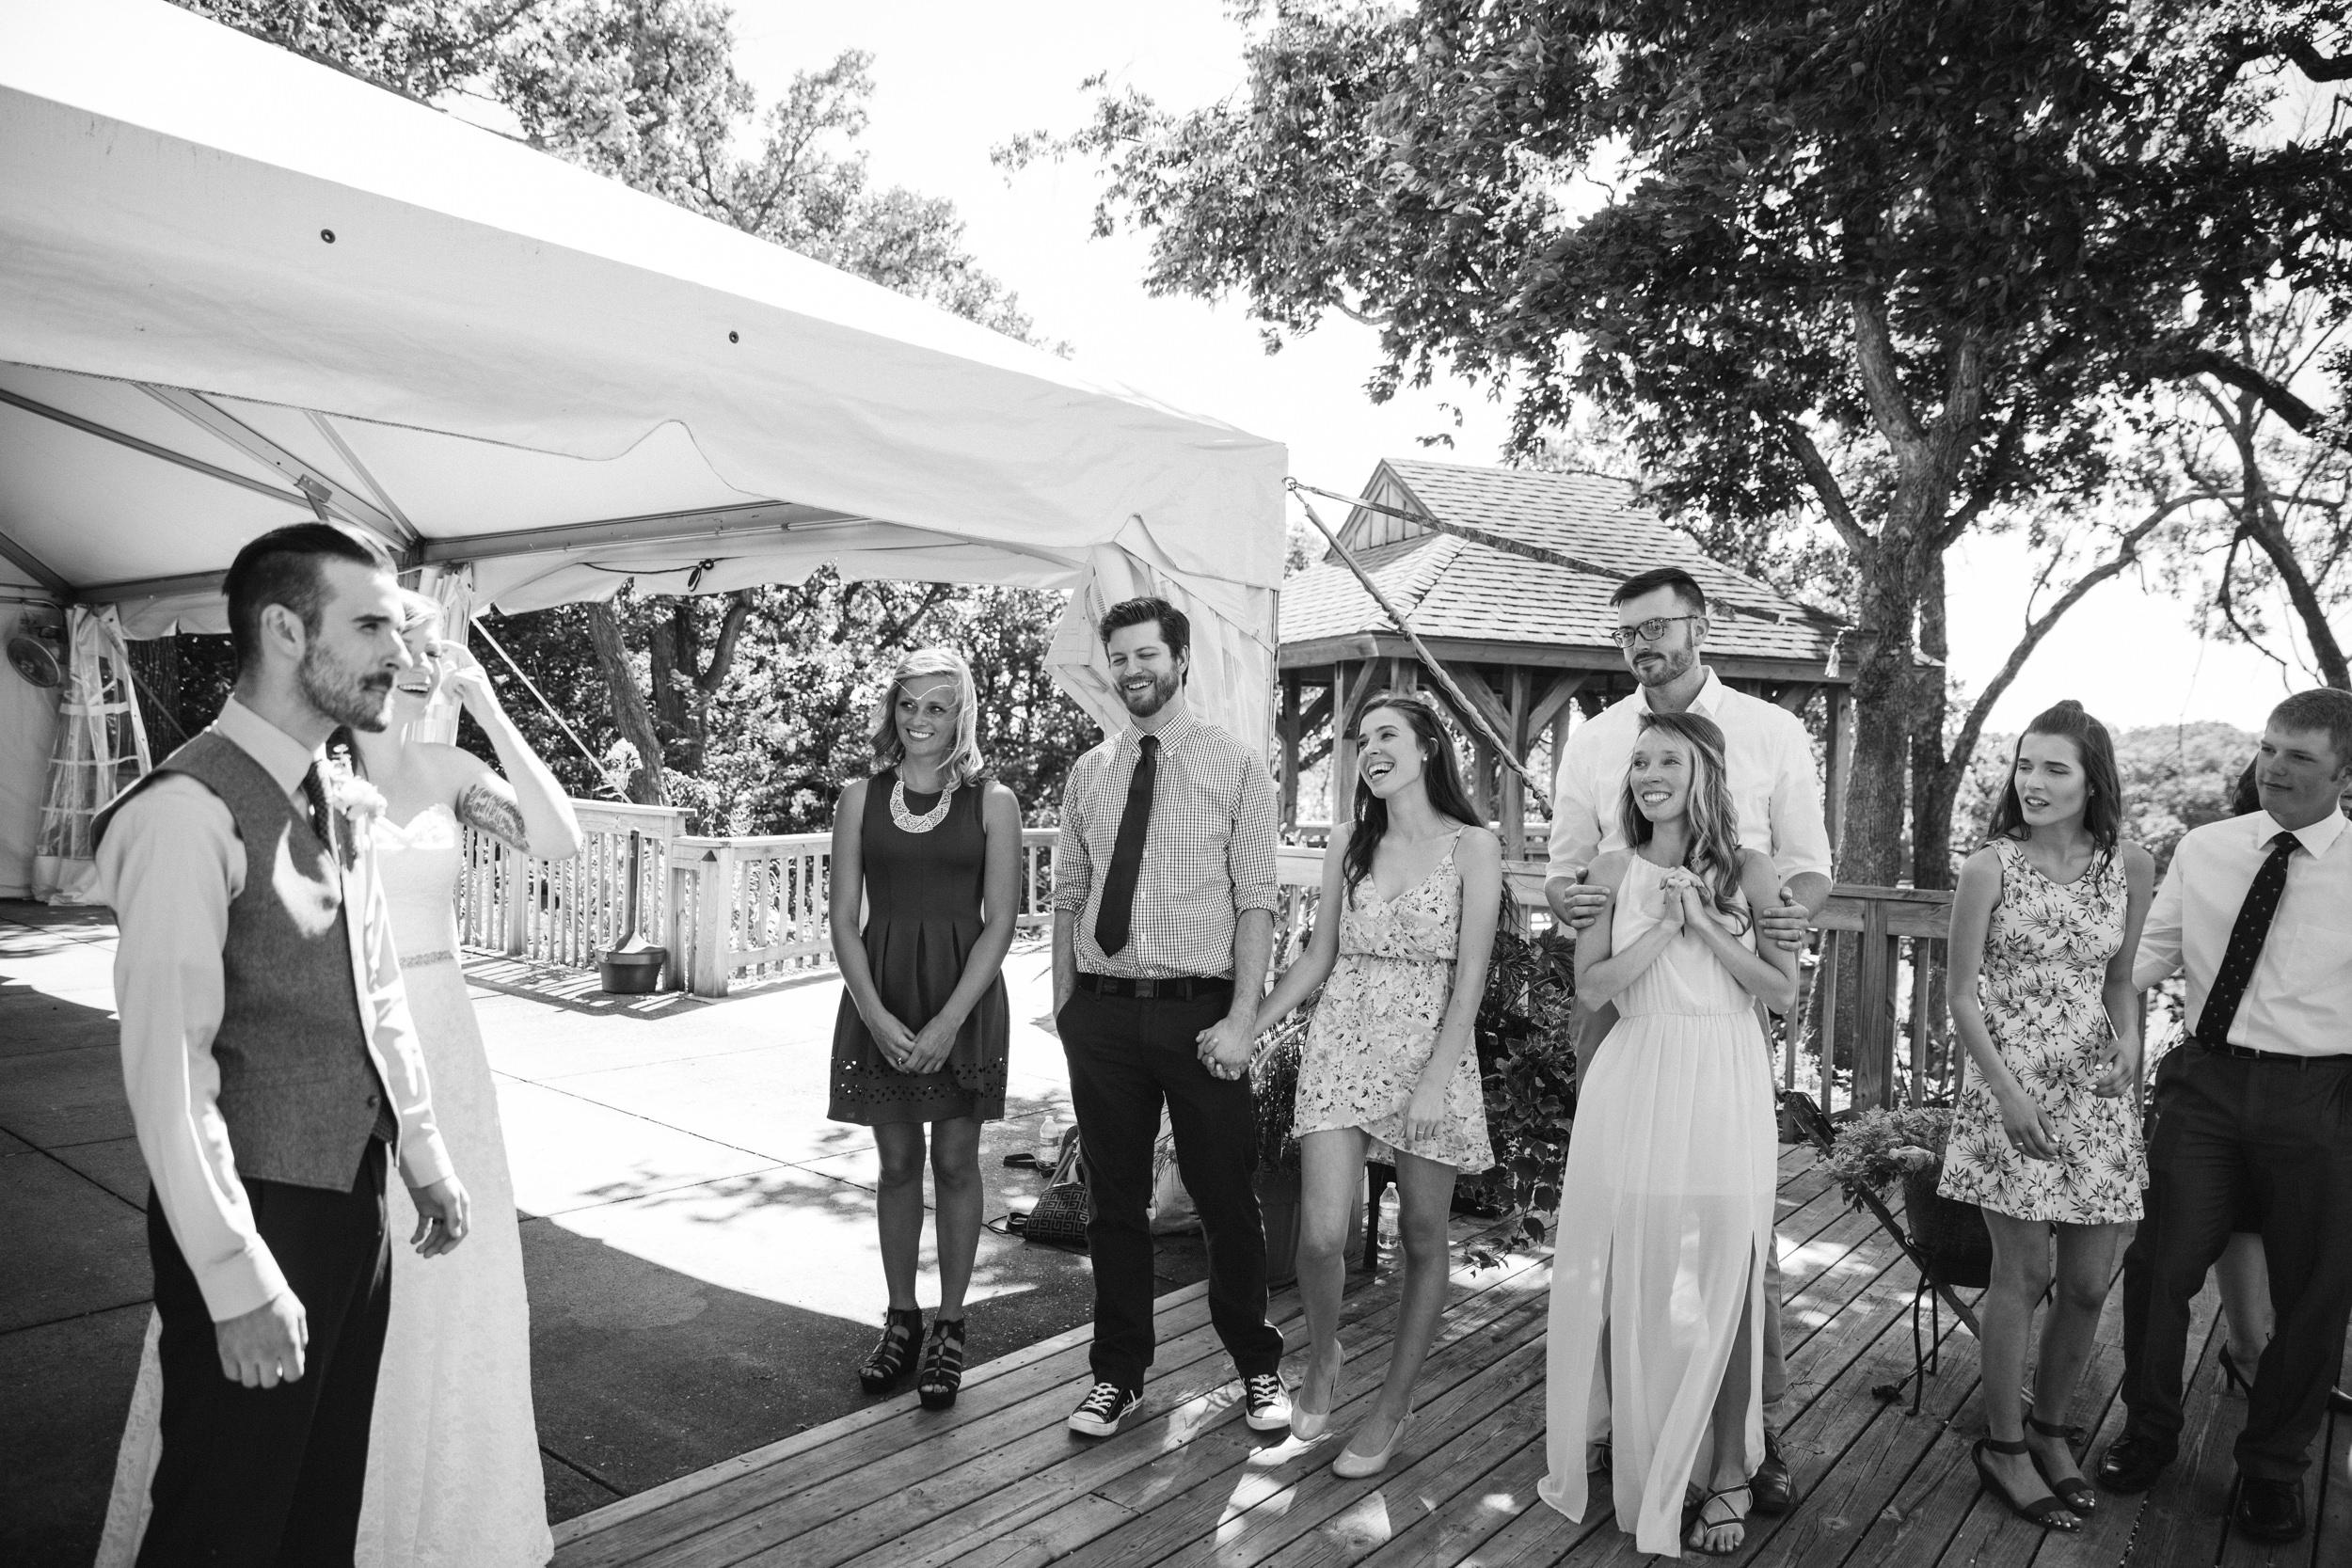 7-25-2015 Sarah and Jimmy's Eagle Ridge Downtown Galena Wedding-158.jpg